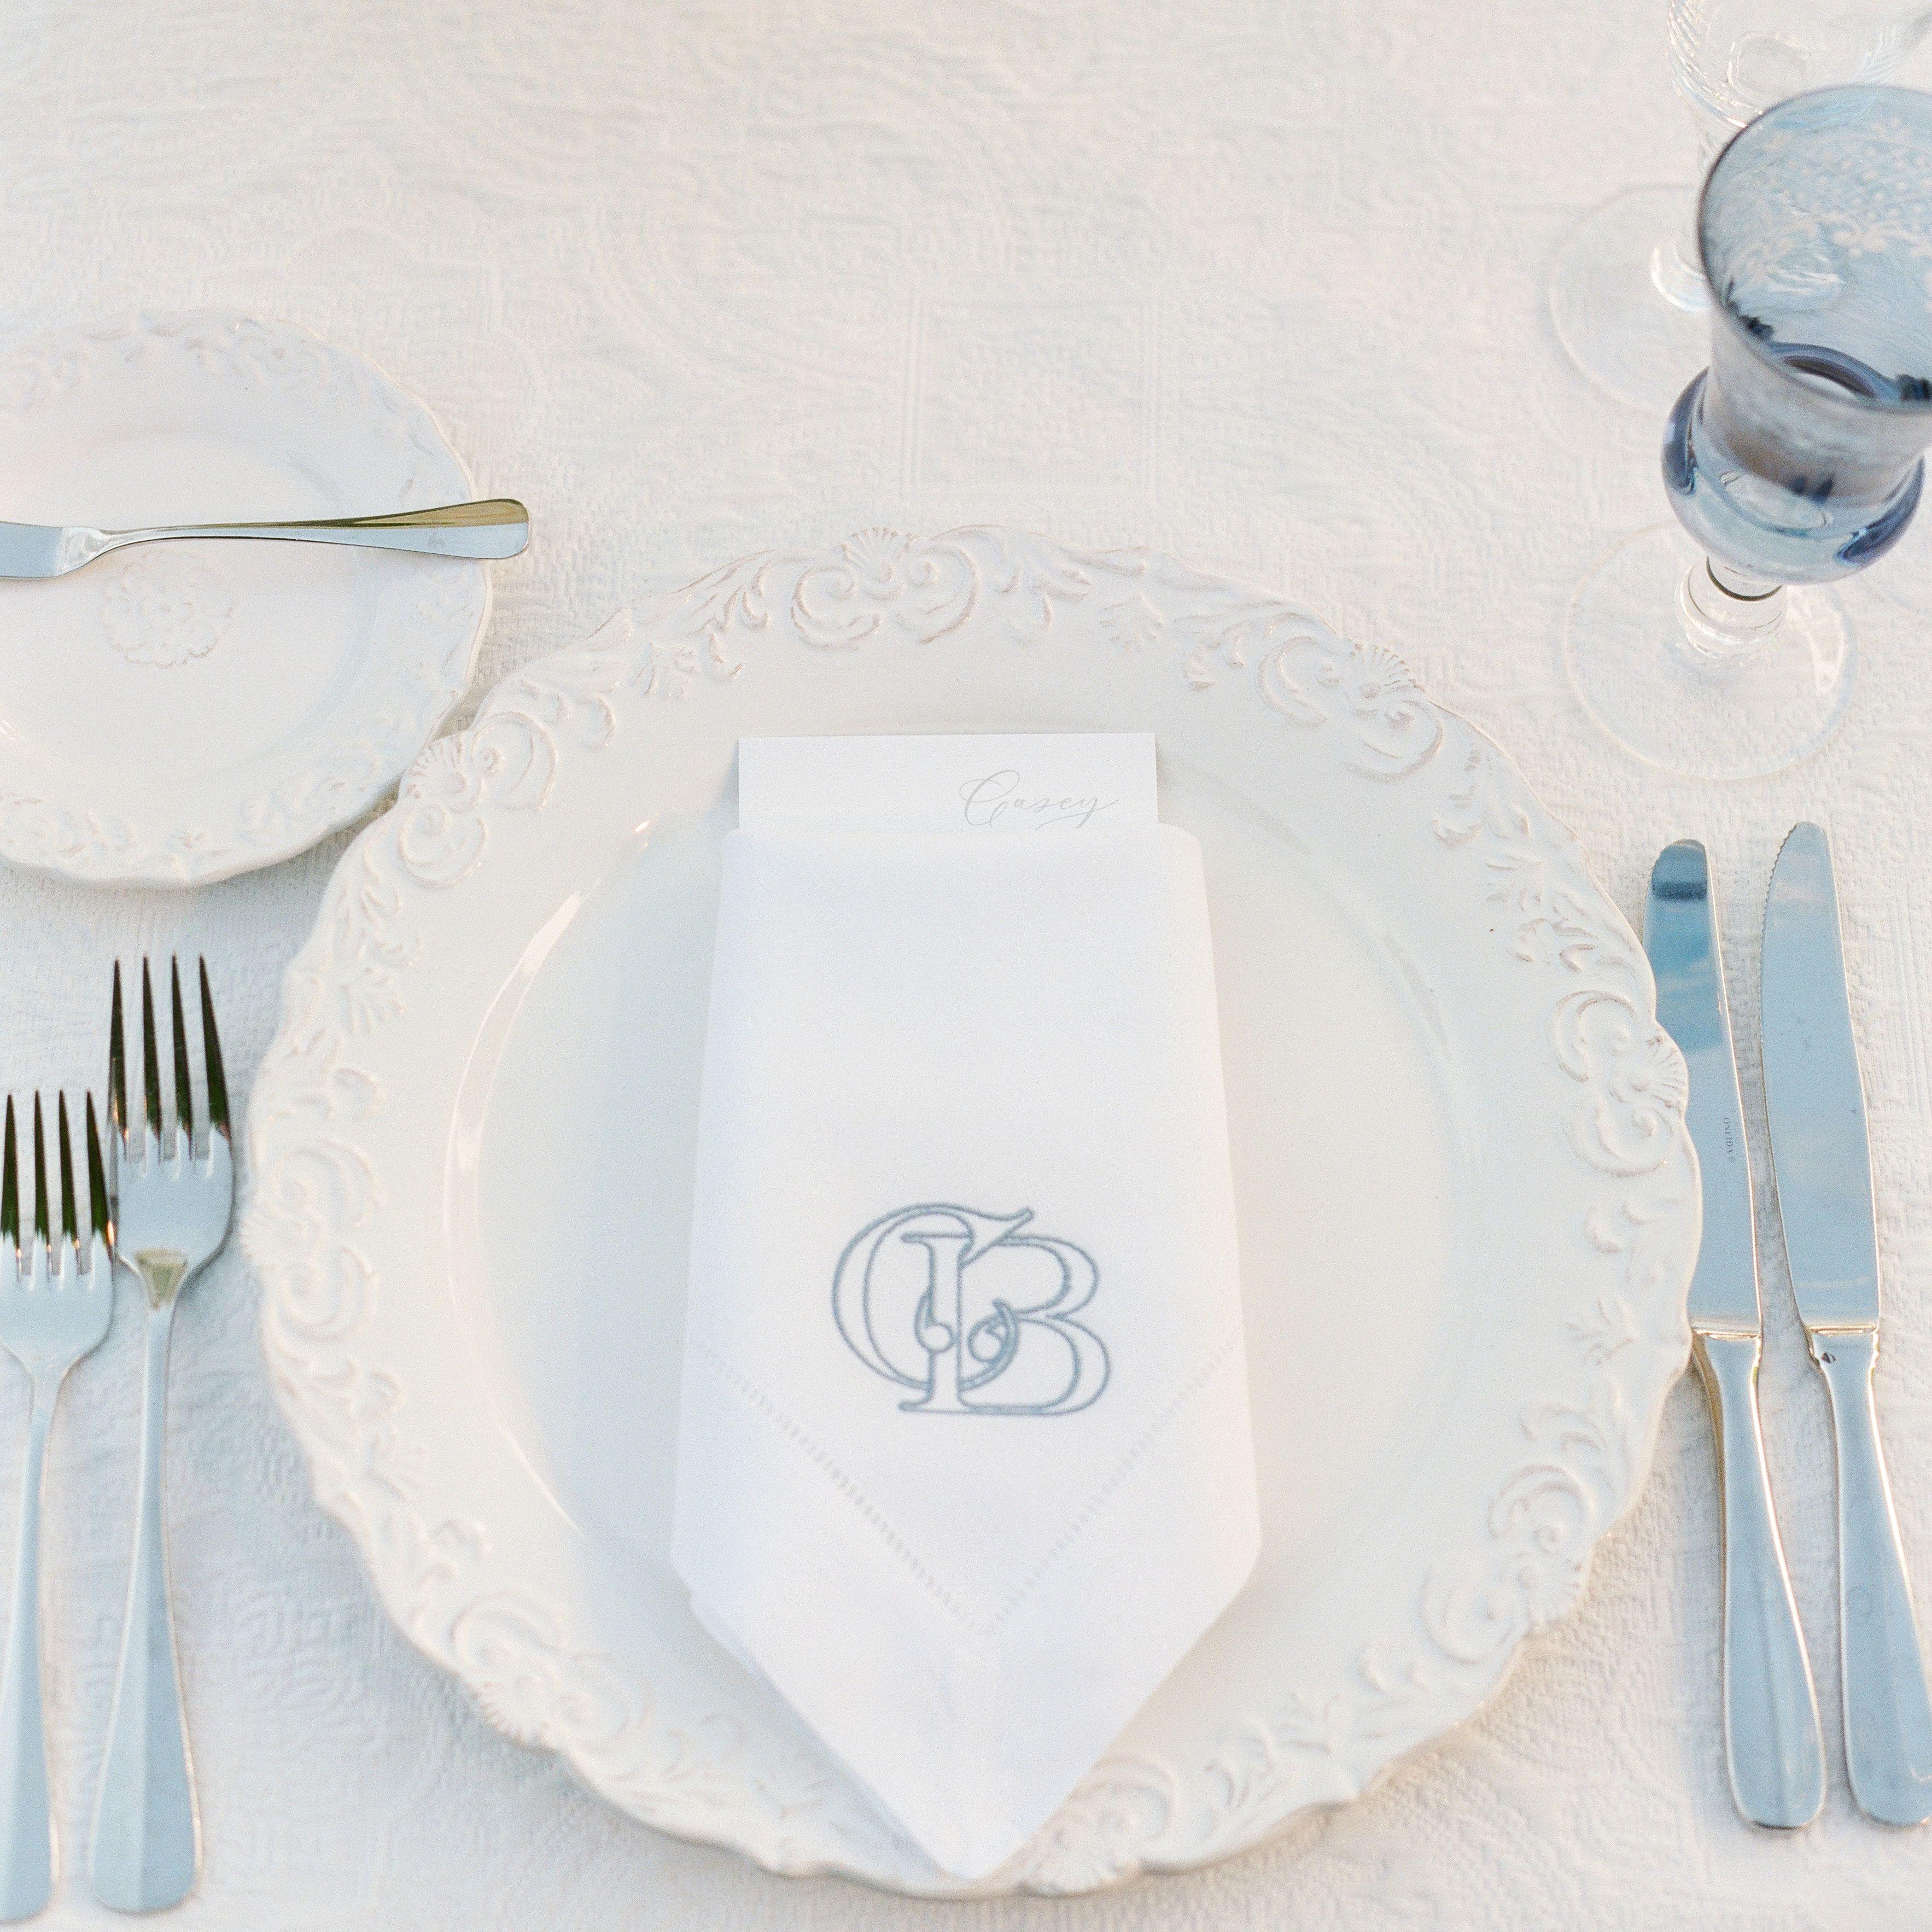 wedding forks newlywed gift mr mrs forks engagement gift wedding silverware wedding gift gifts for bride to be